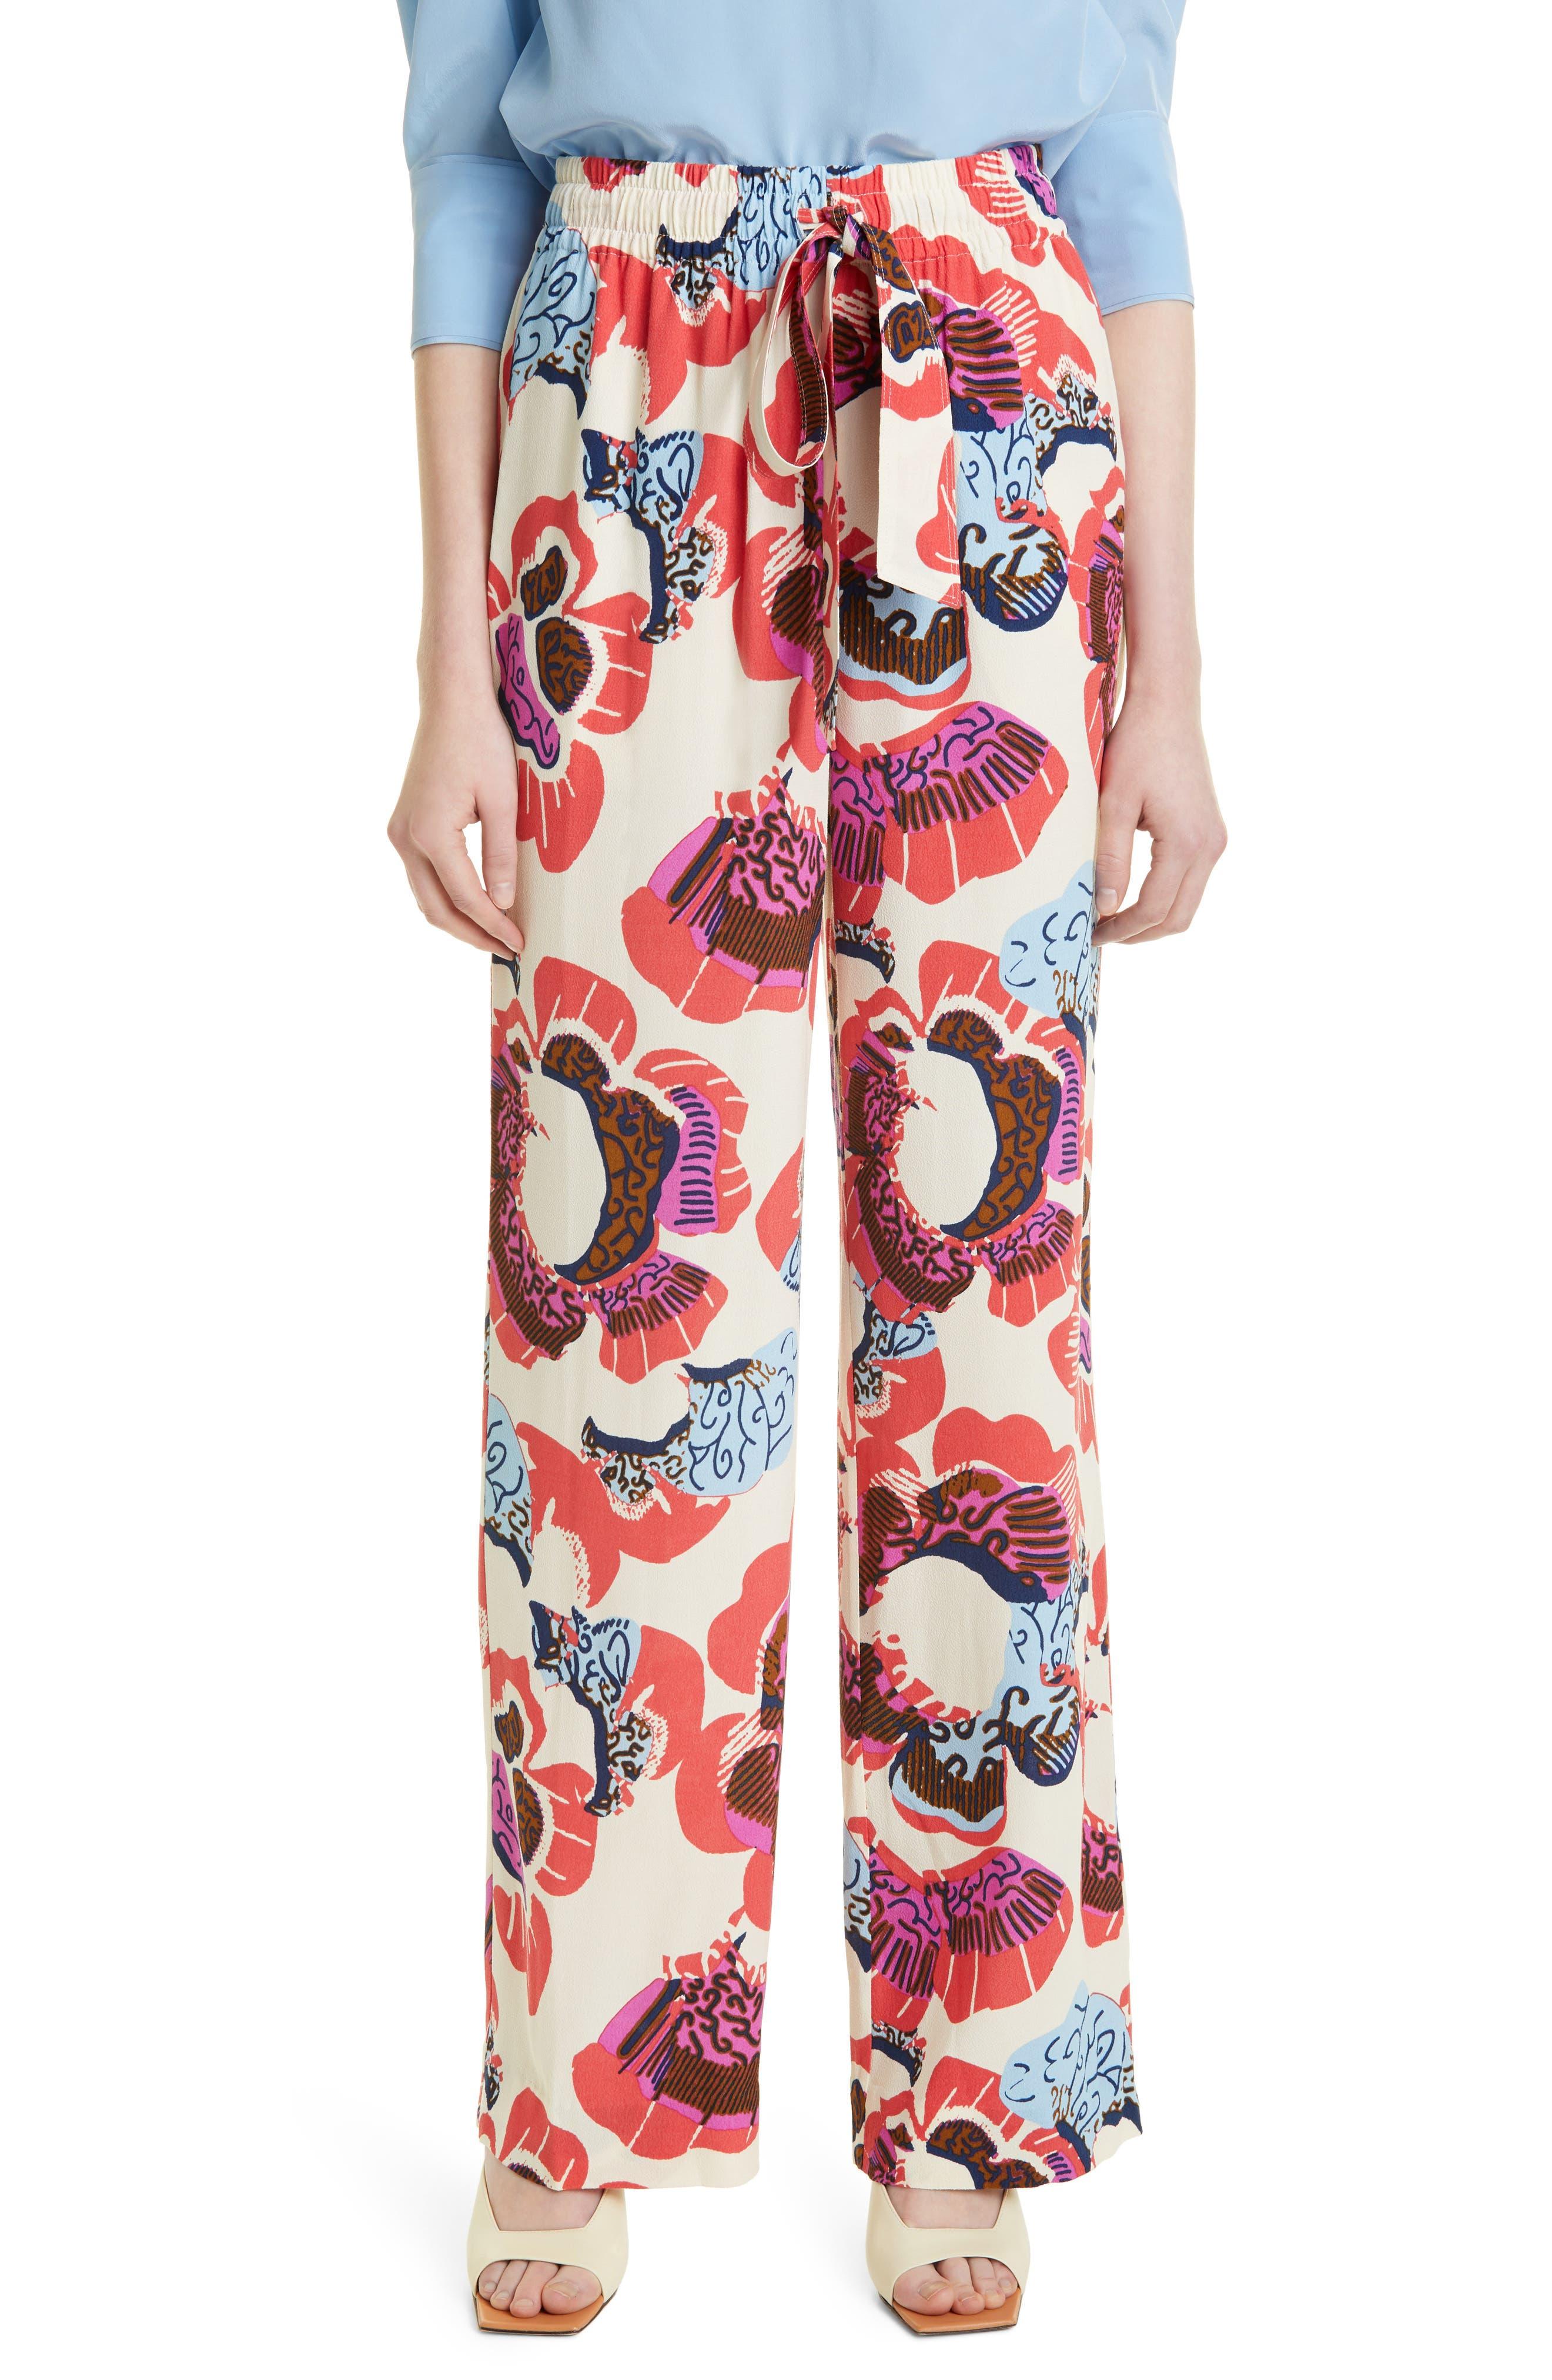 Denise Floral Drawstring Pants